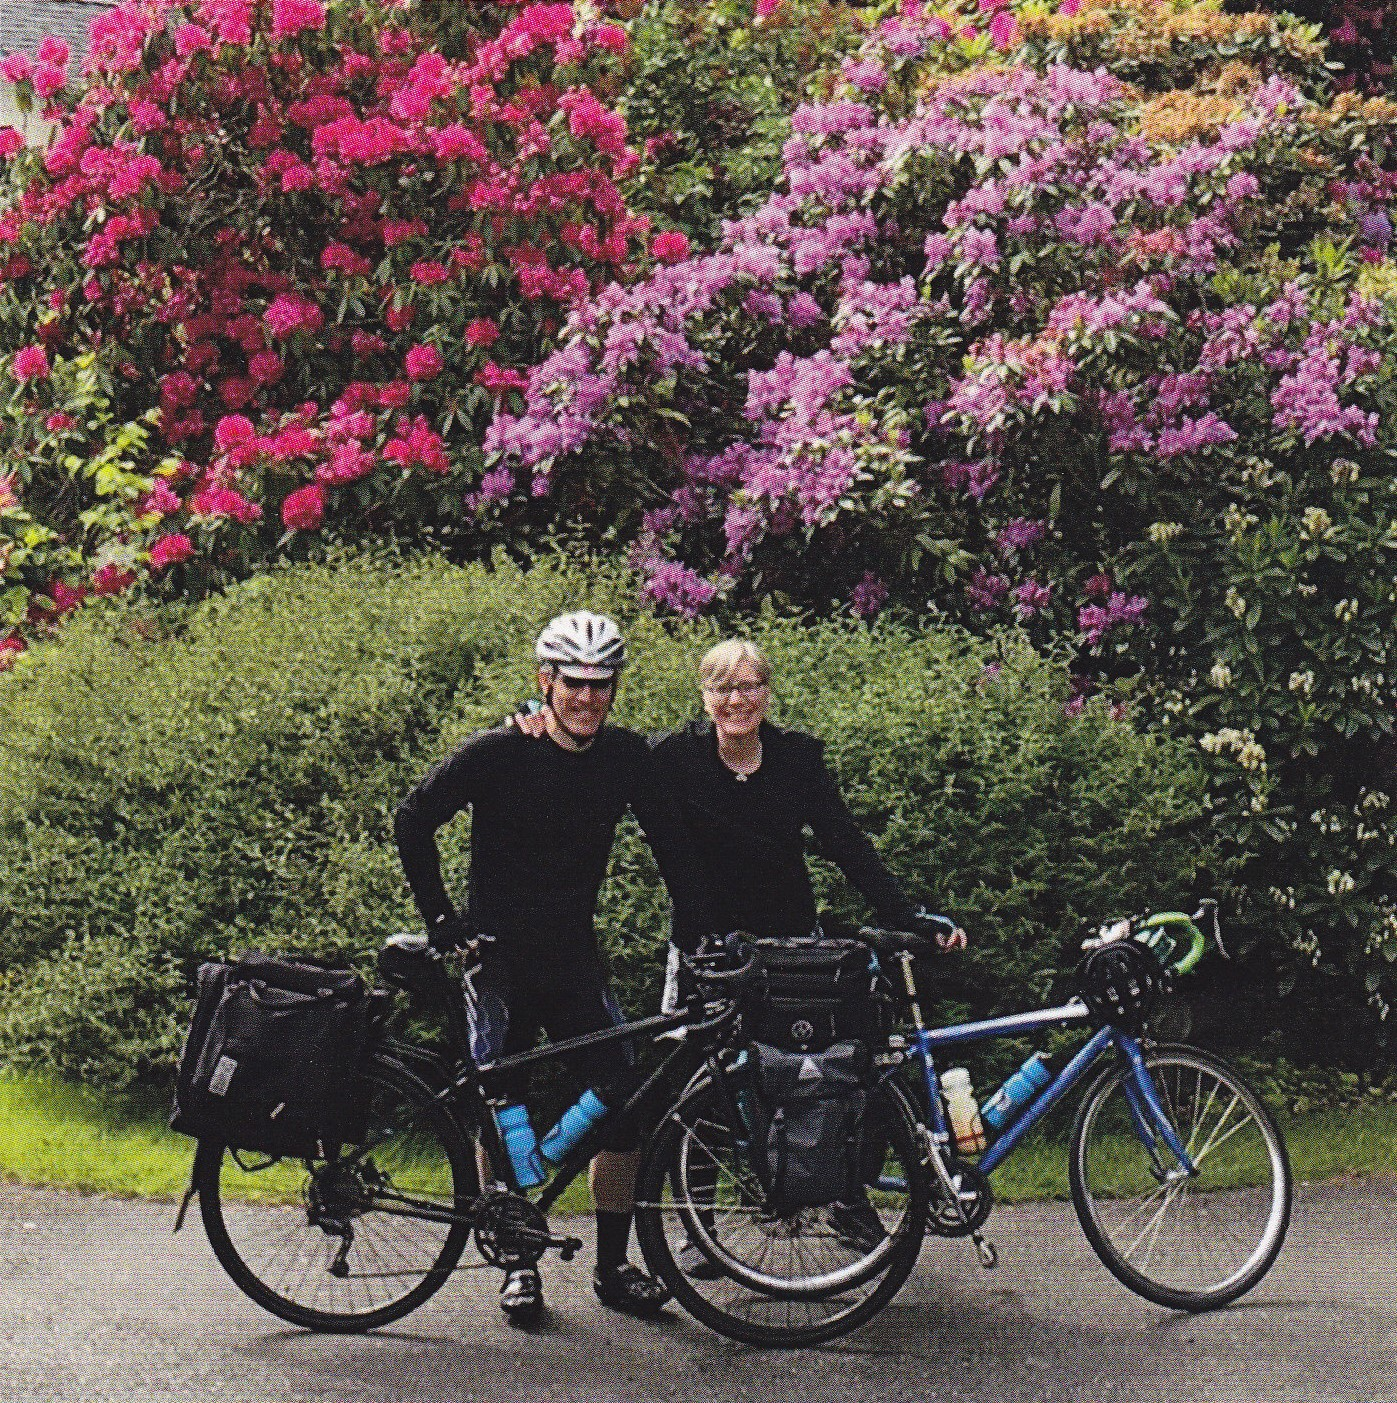 Two Wheel Gear - Garment Pannier - Bike Tour